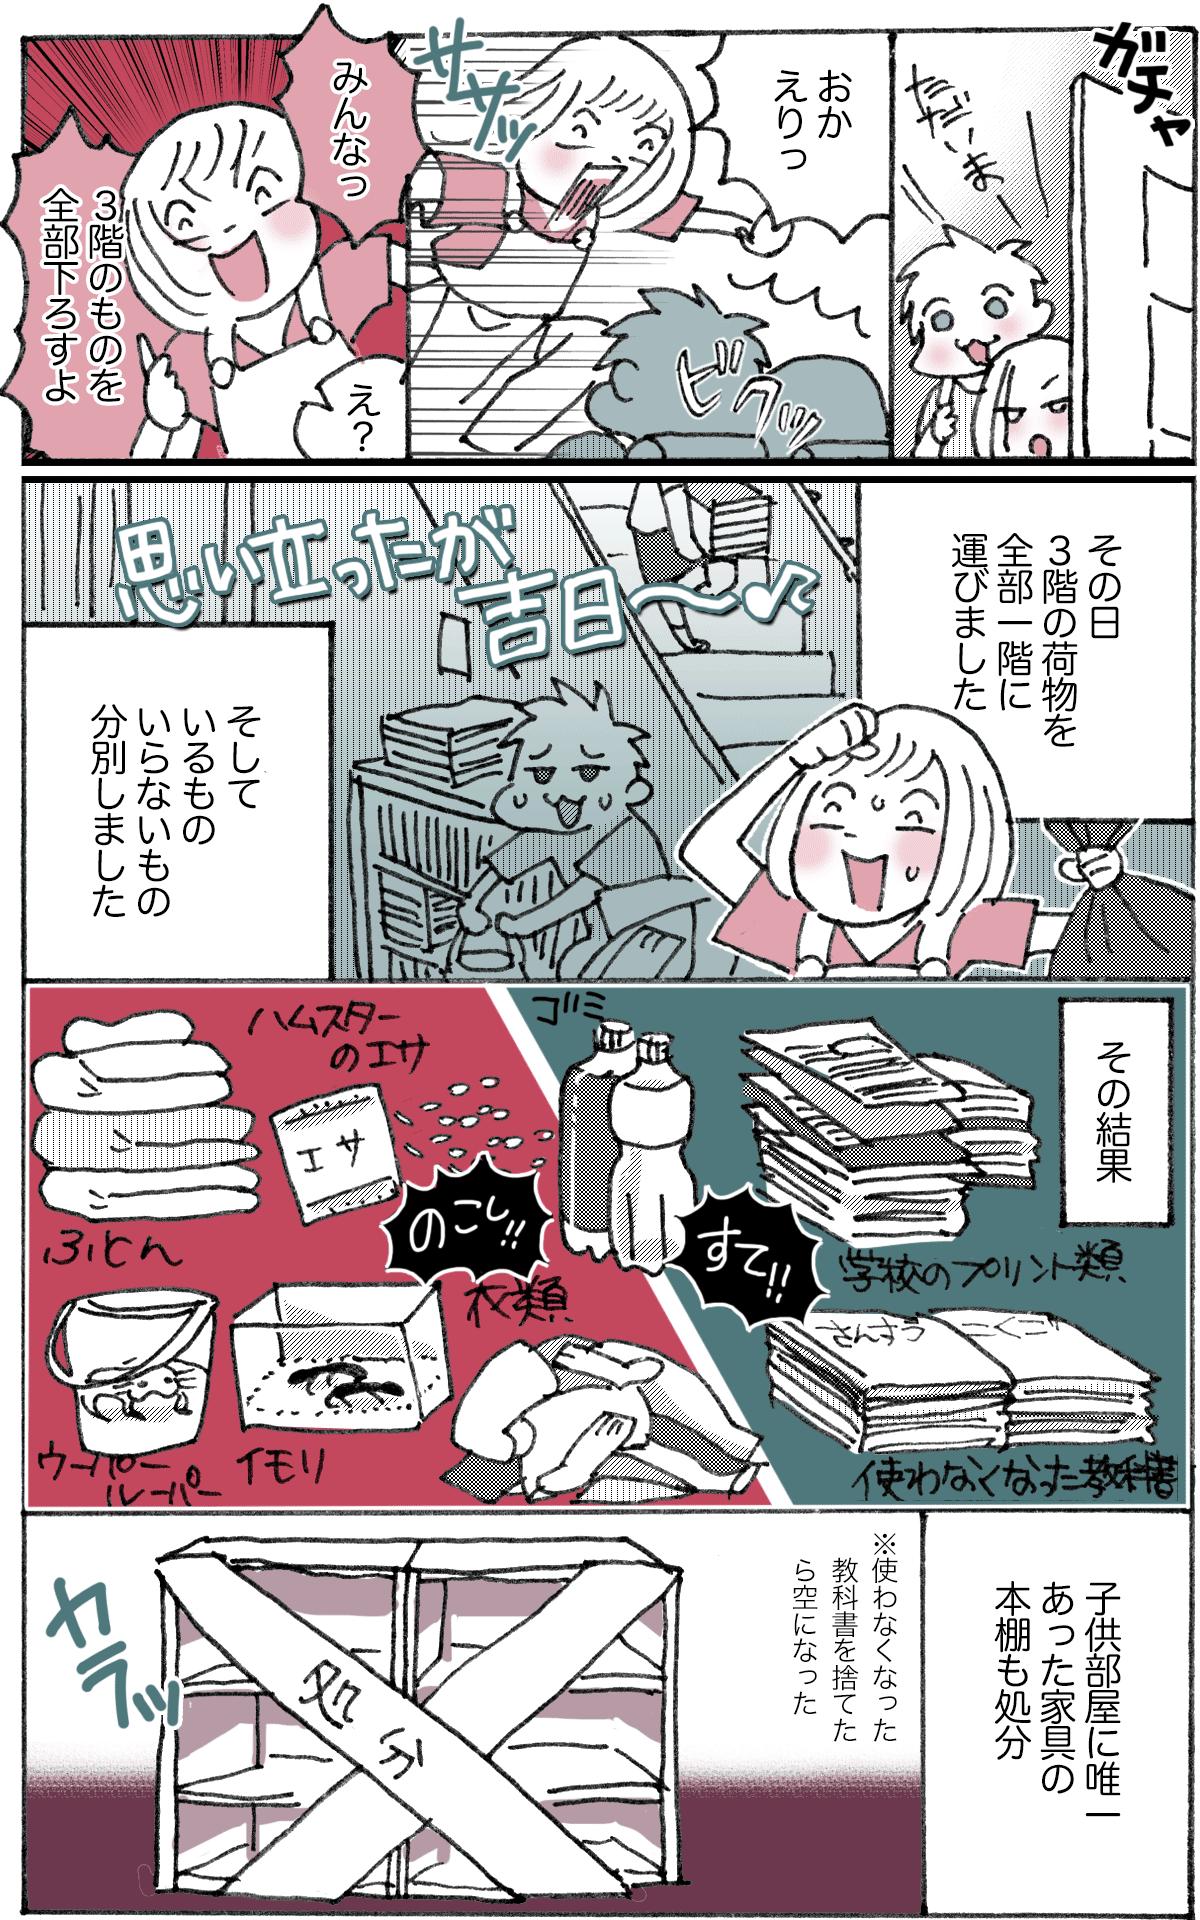 MK4_05